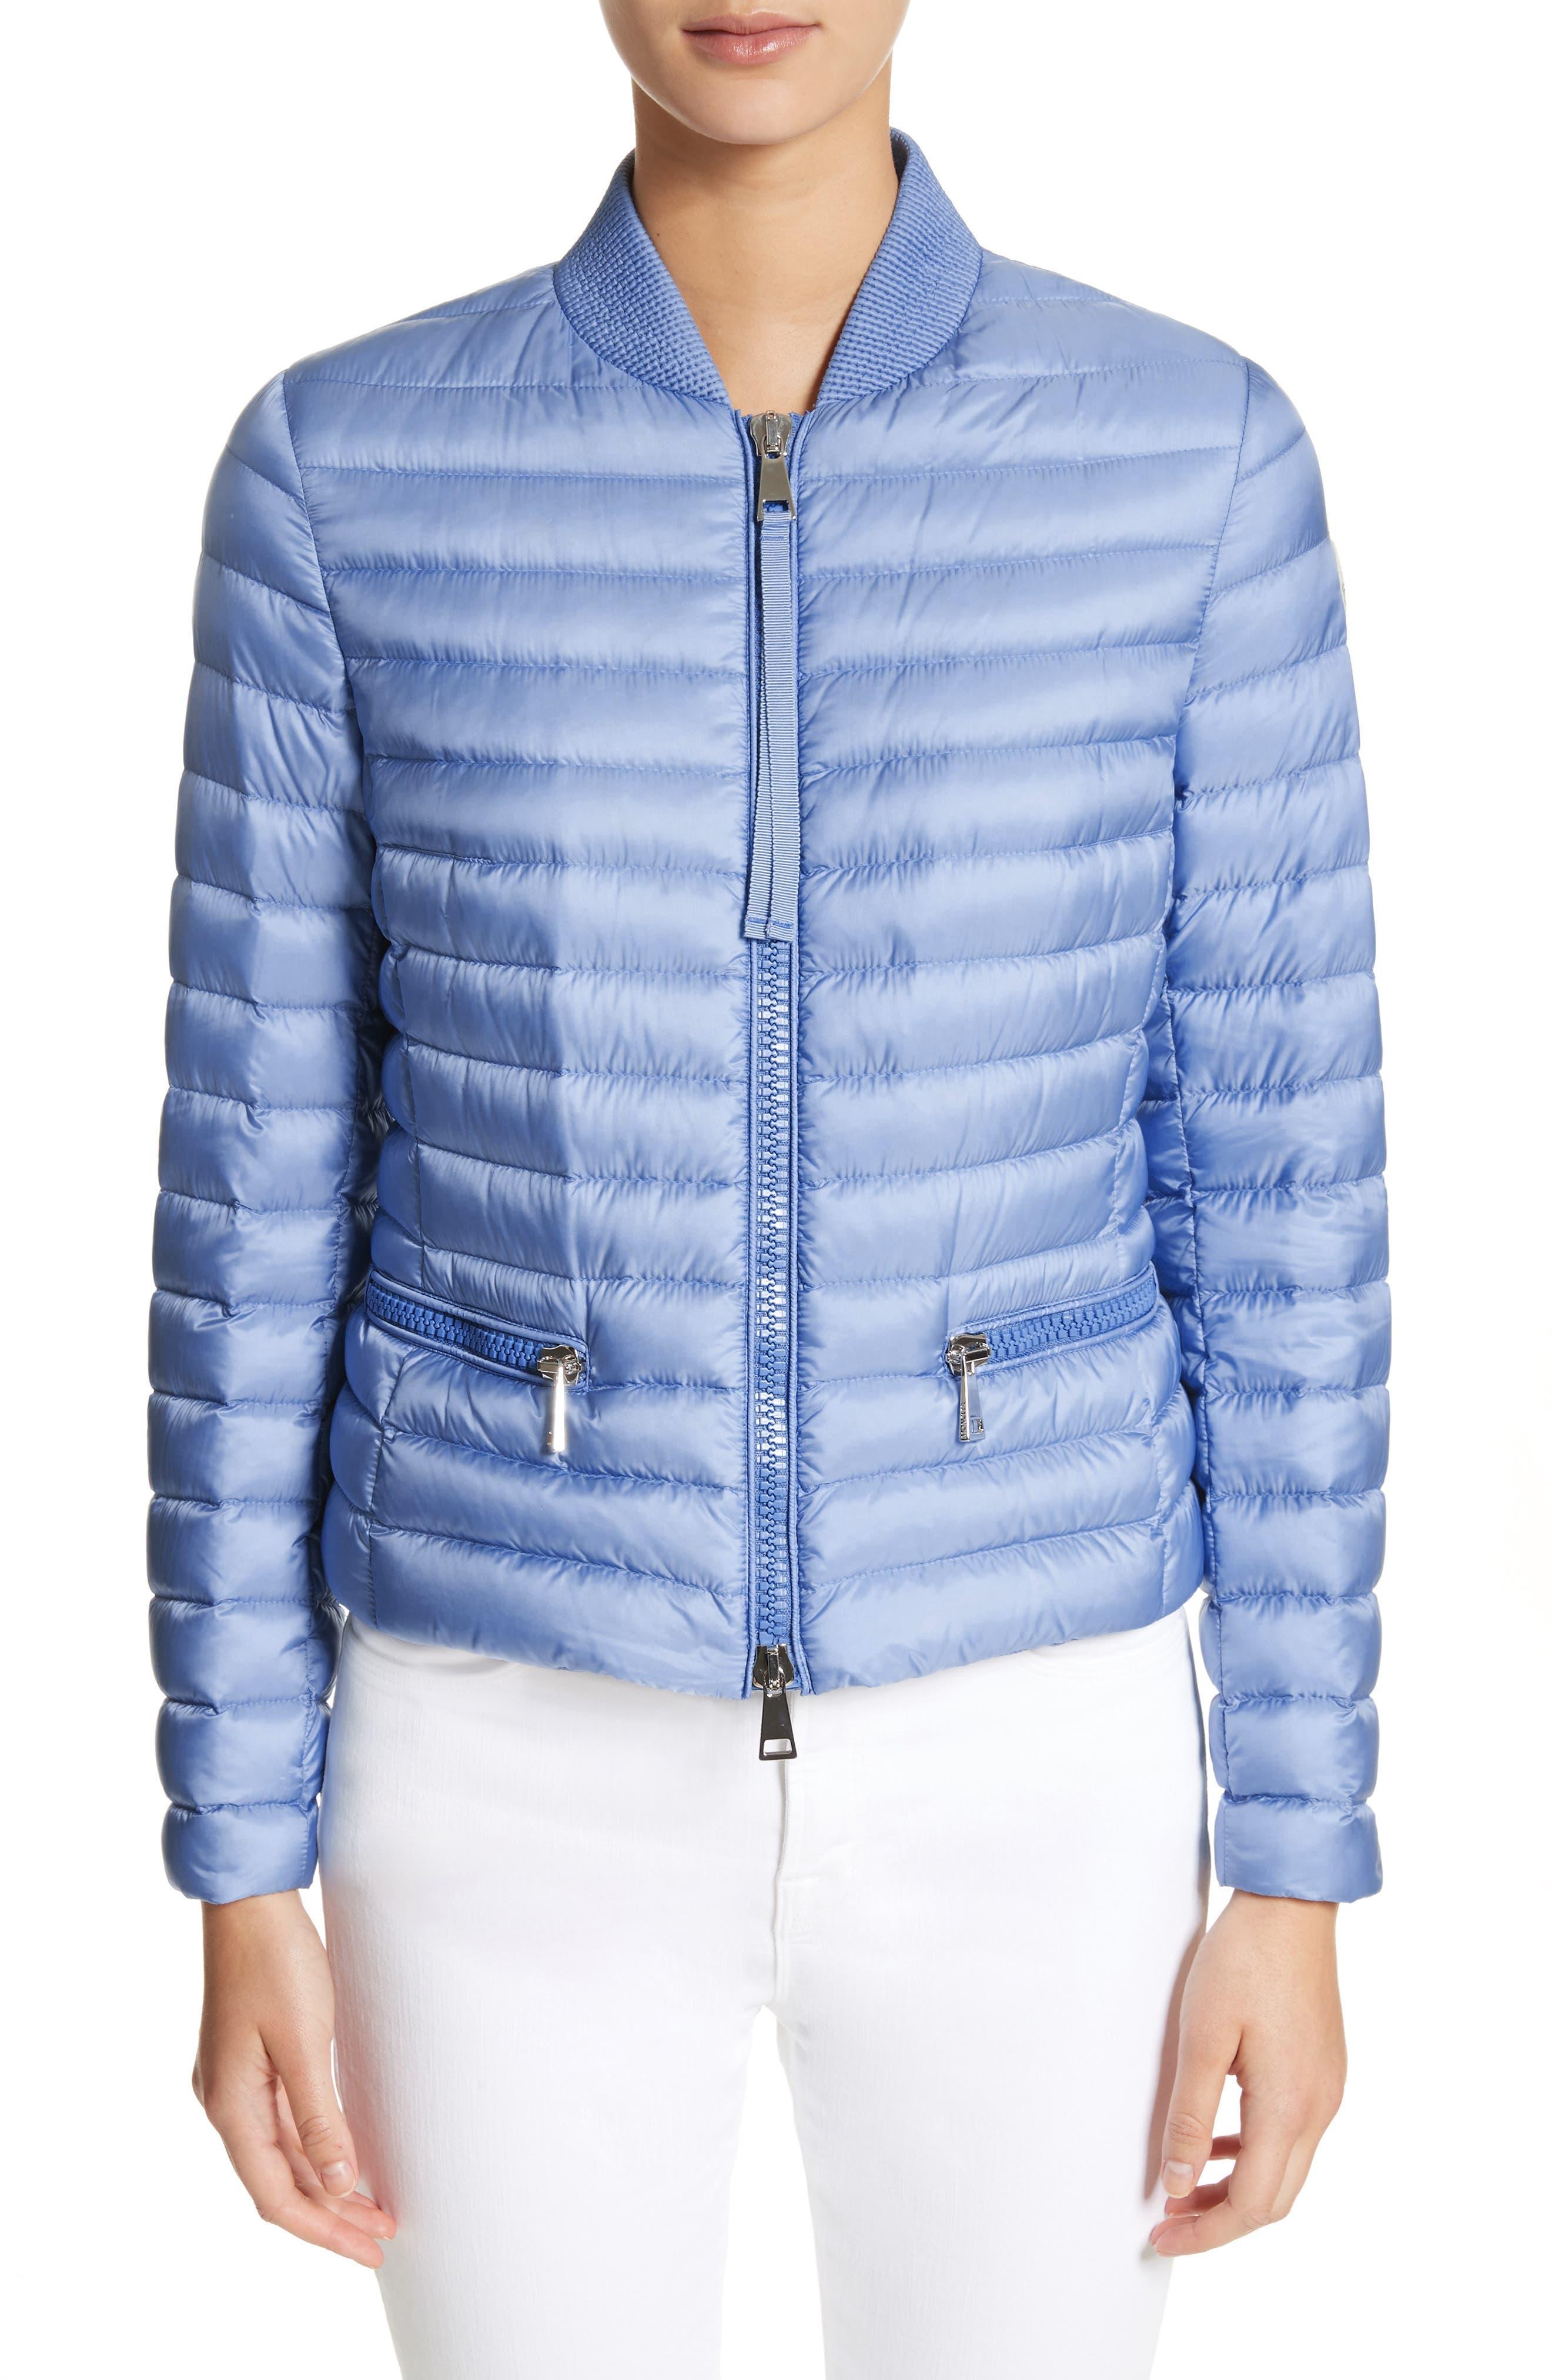 Blen Down Jacket,                         Main,                         color, Blue